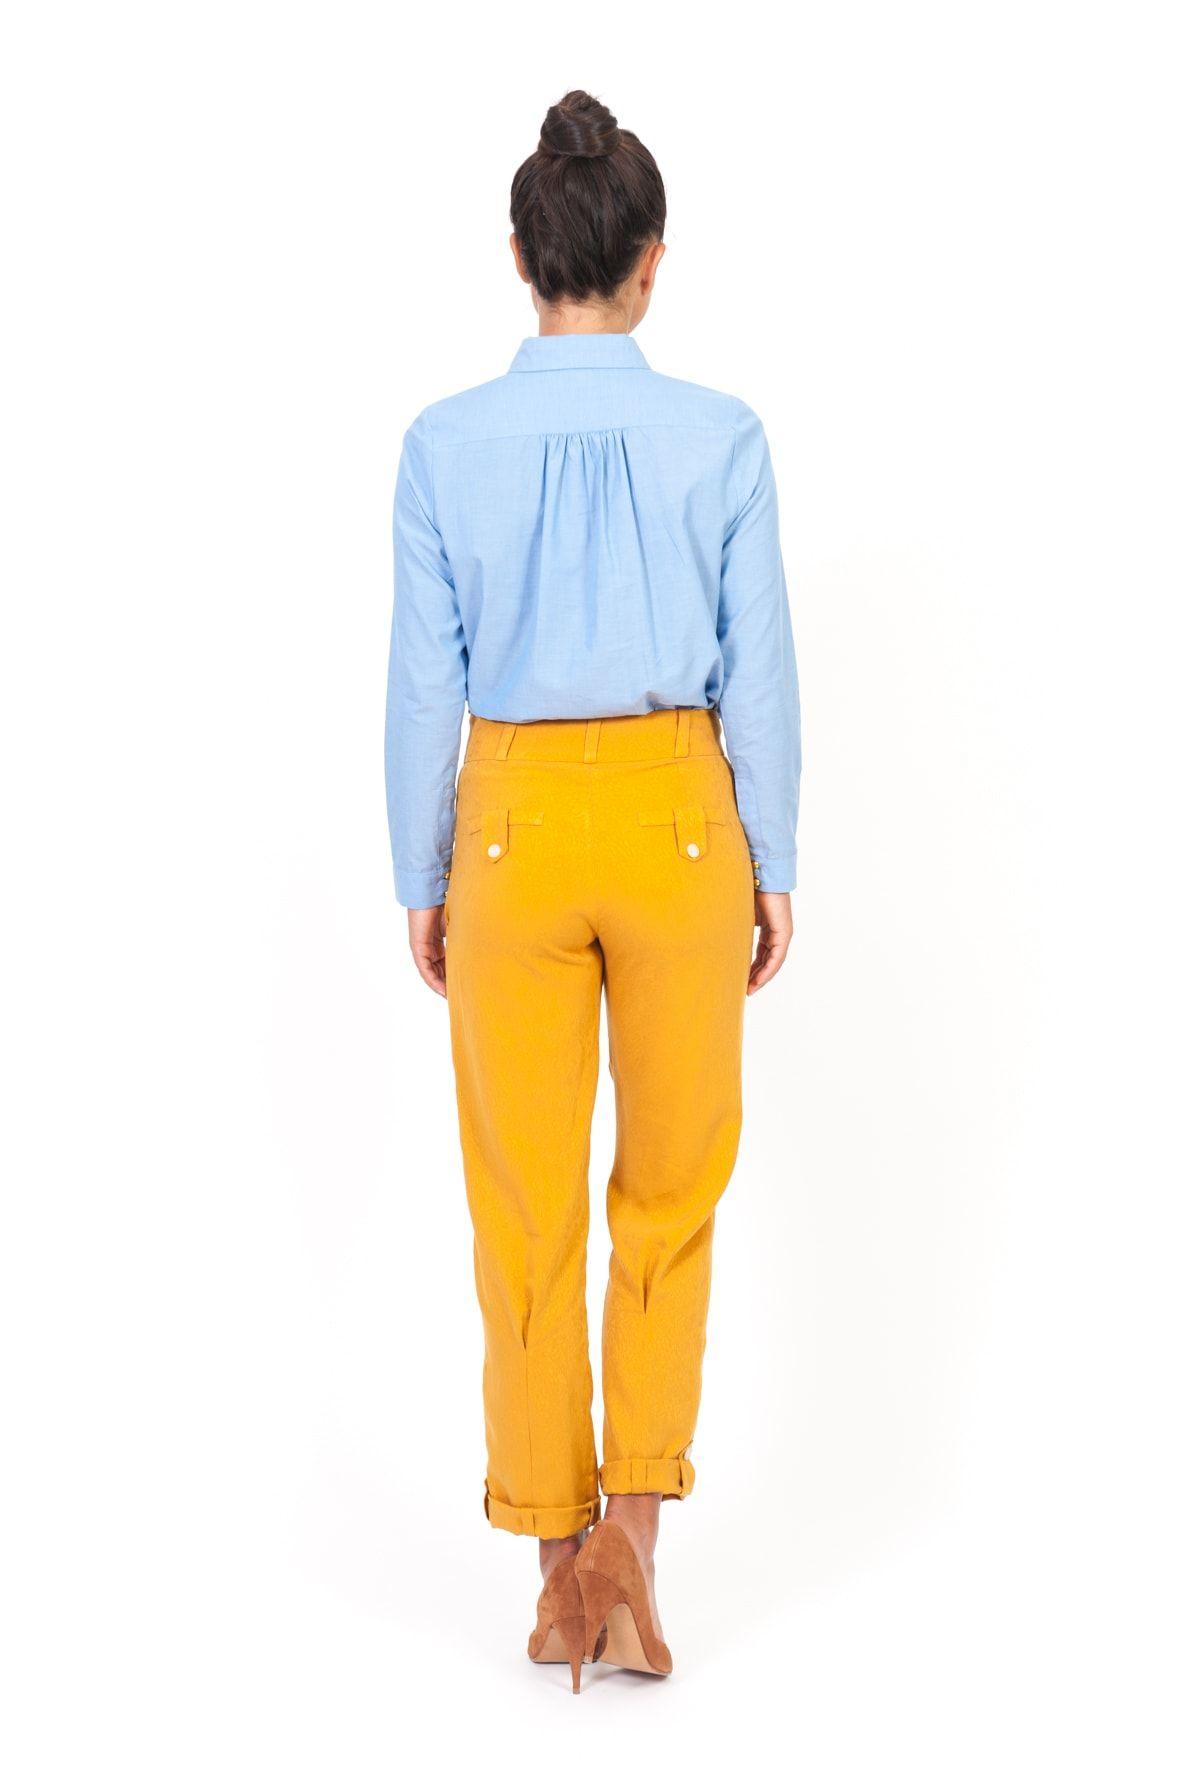 pantalon raoul sun jaune